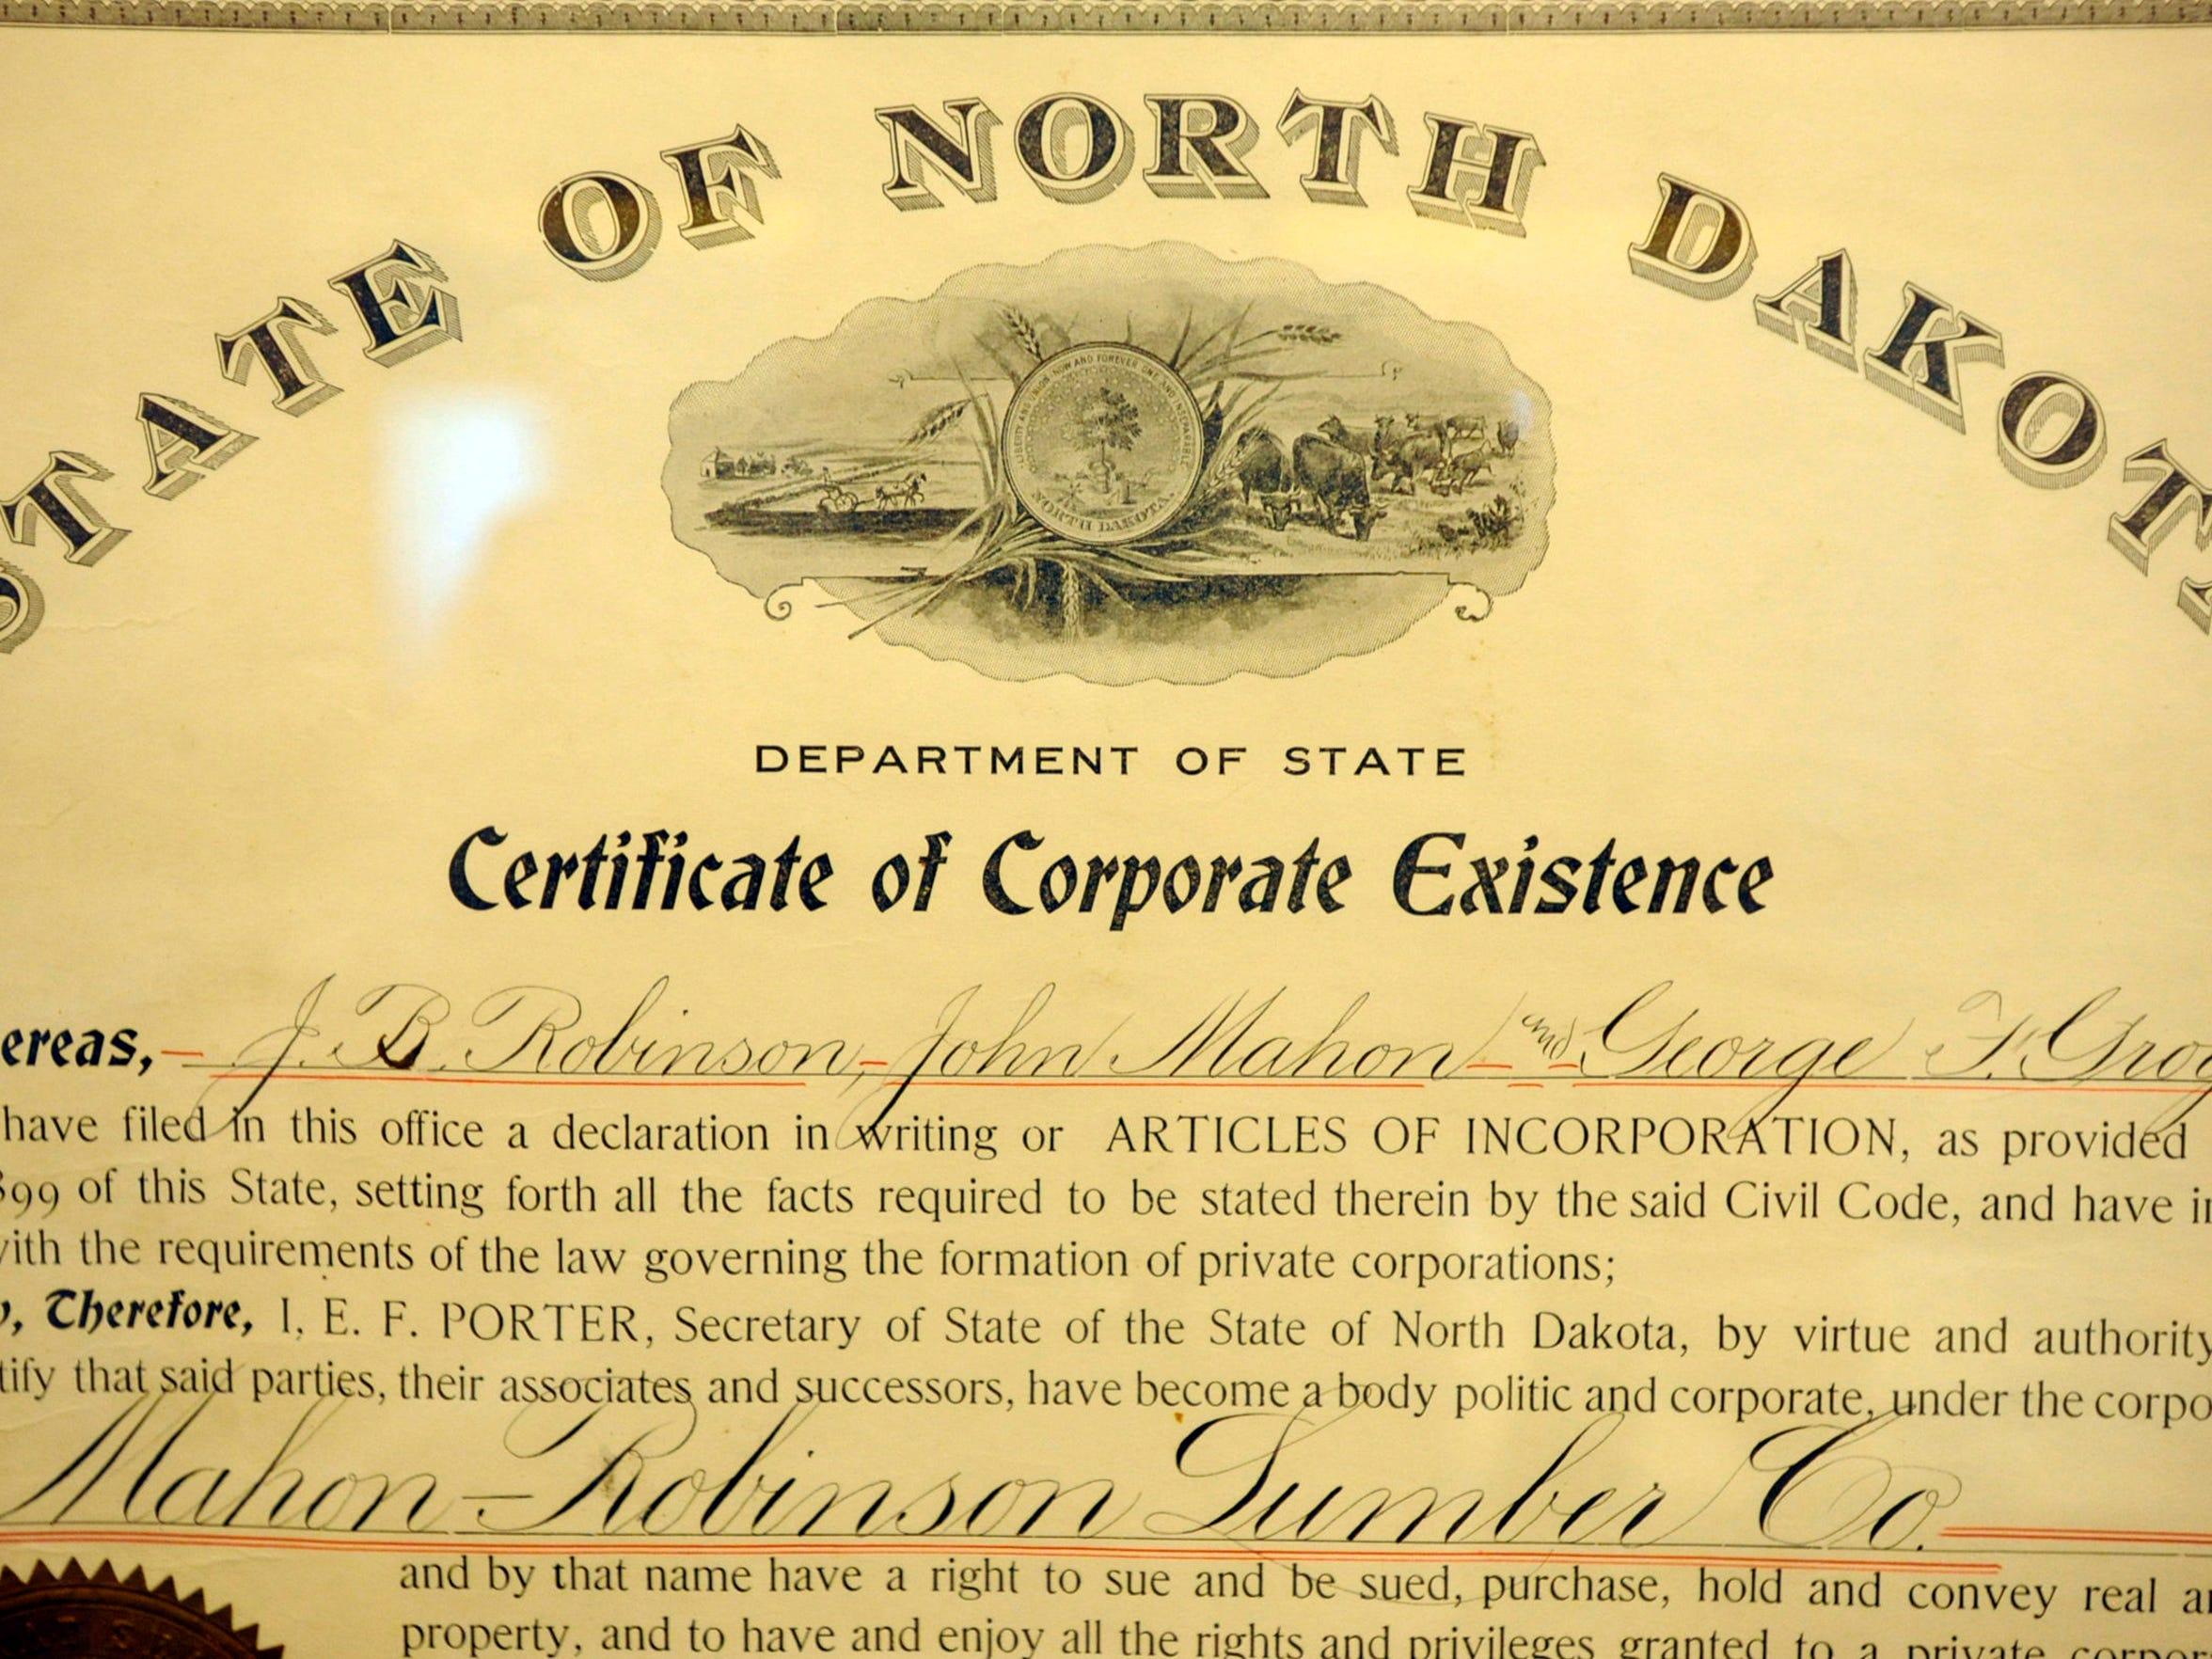 Lumber Yard Supply 1906 business charter.